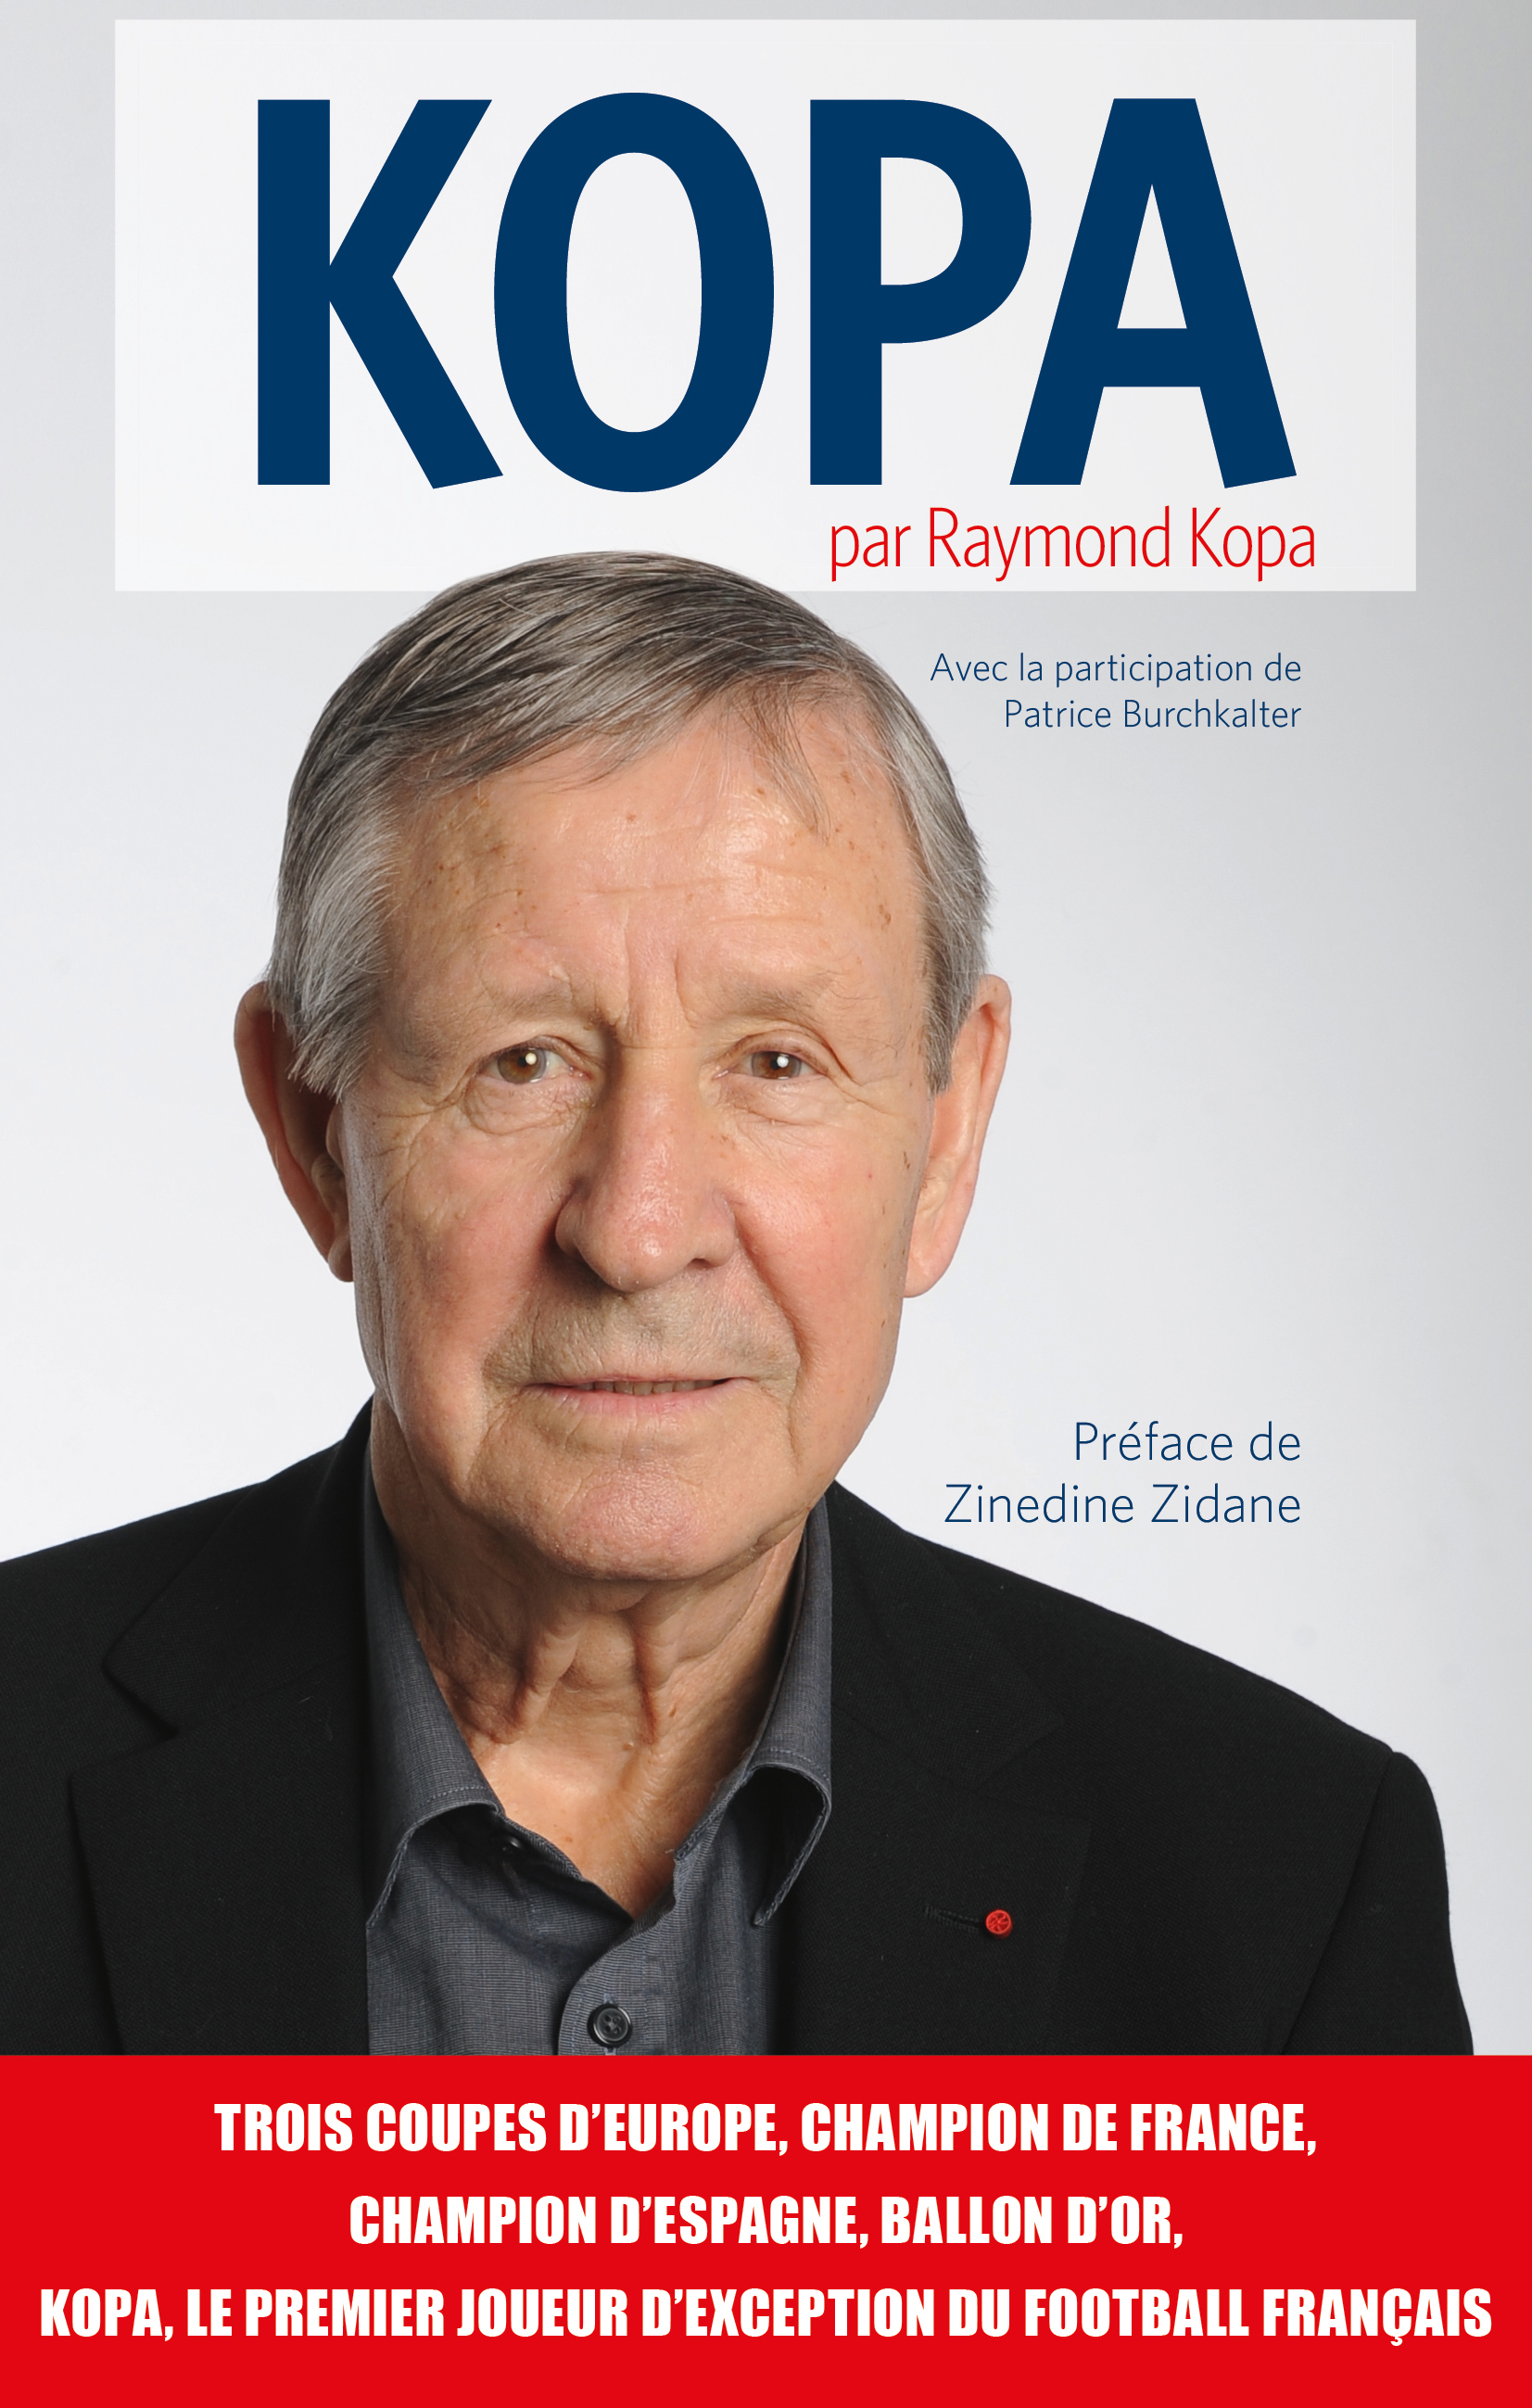 champion du football fran§ais Raymond Kopa en dédicace  Porticcio